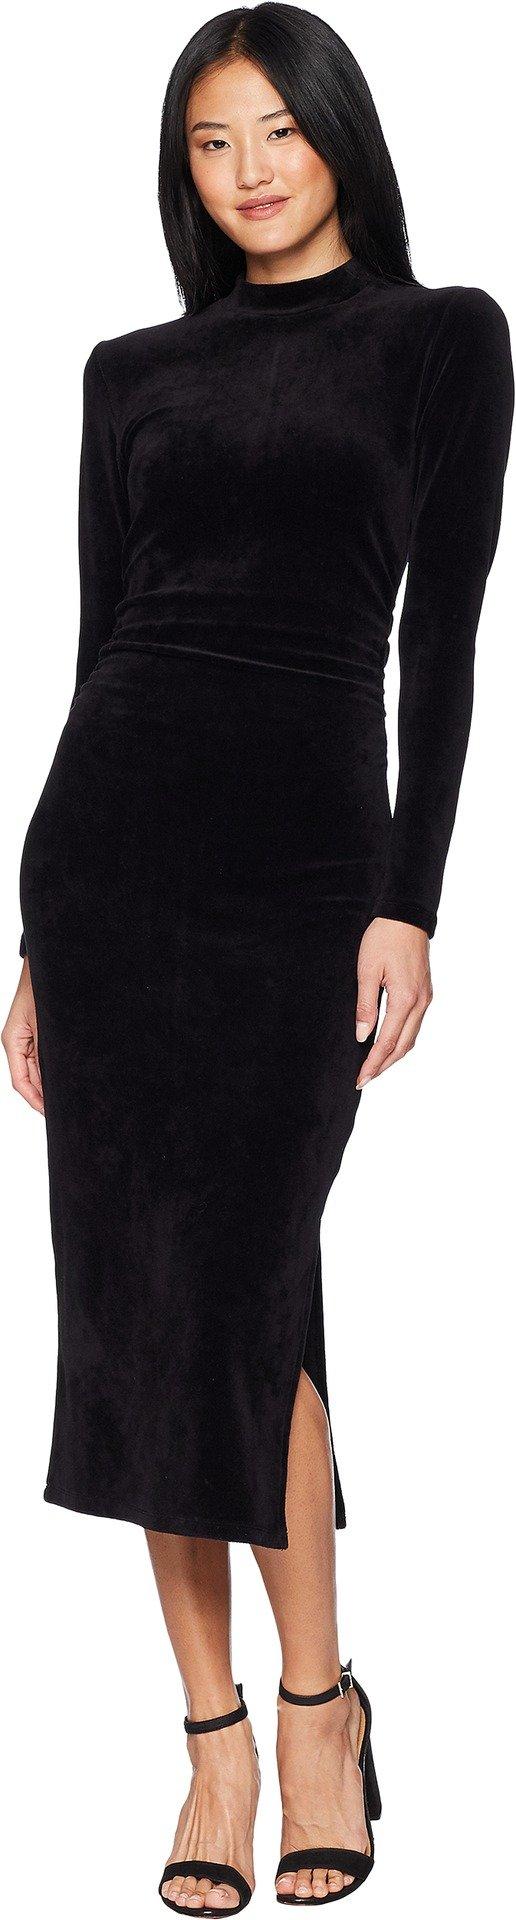 Juicy Couture Women's Track Stretch Velour Mock Neck Midi Dress Pitch Black Large